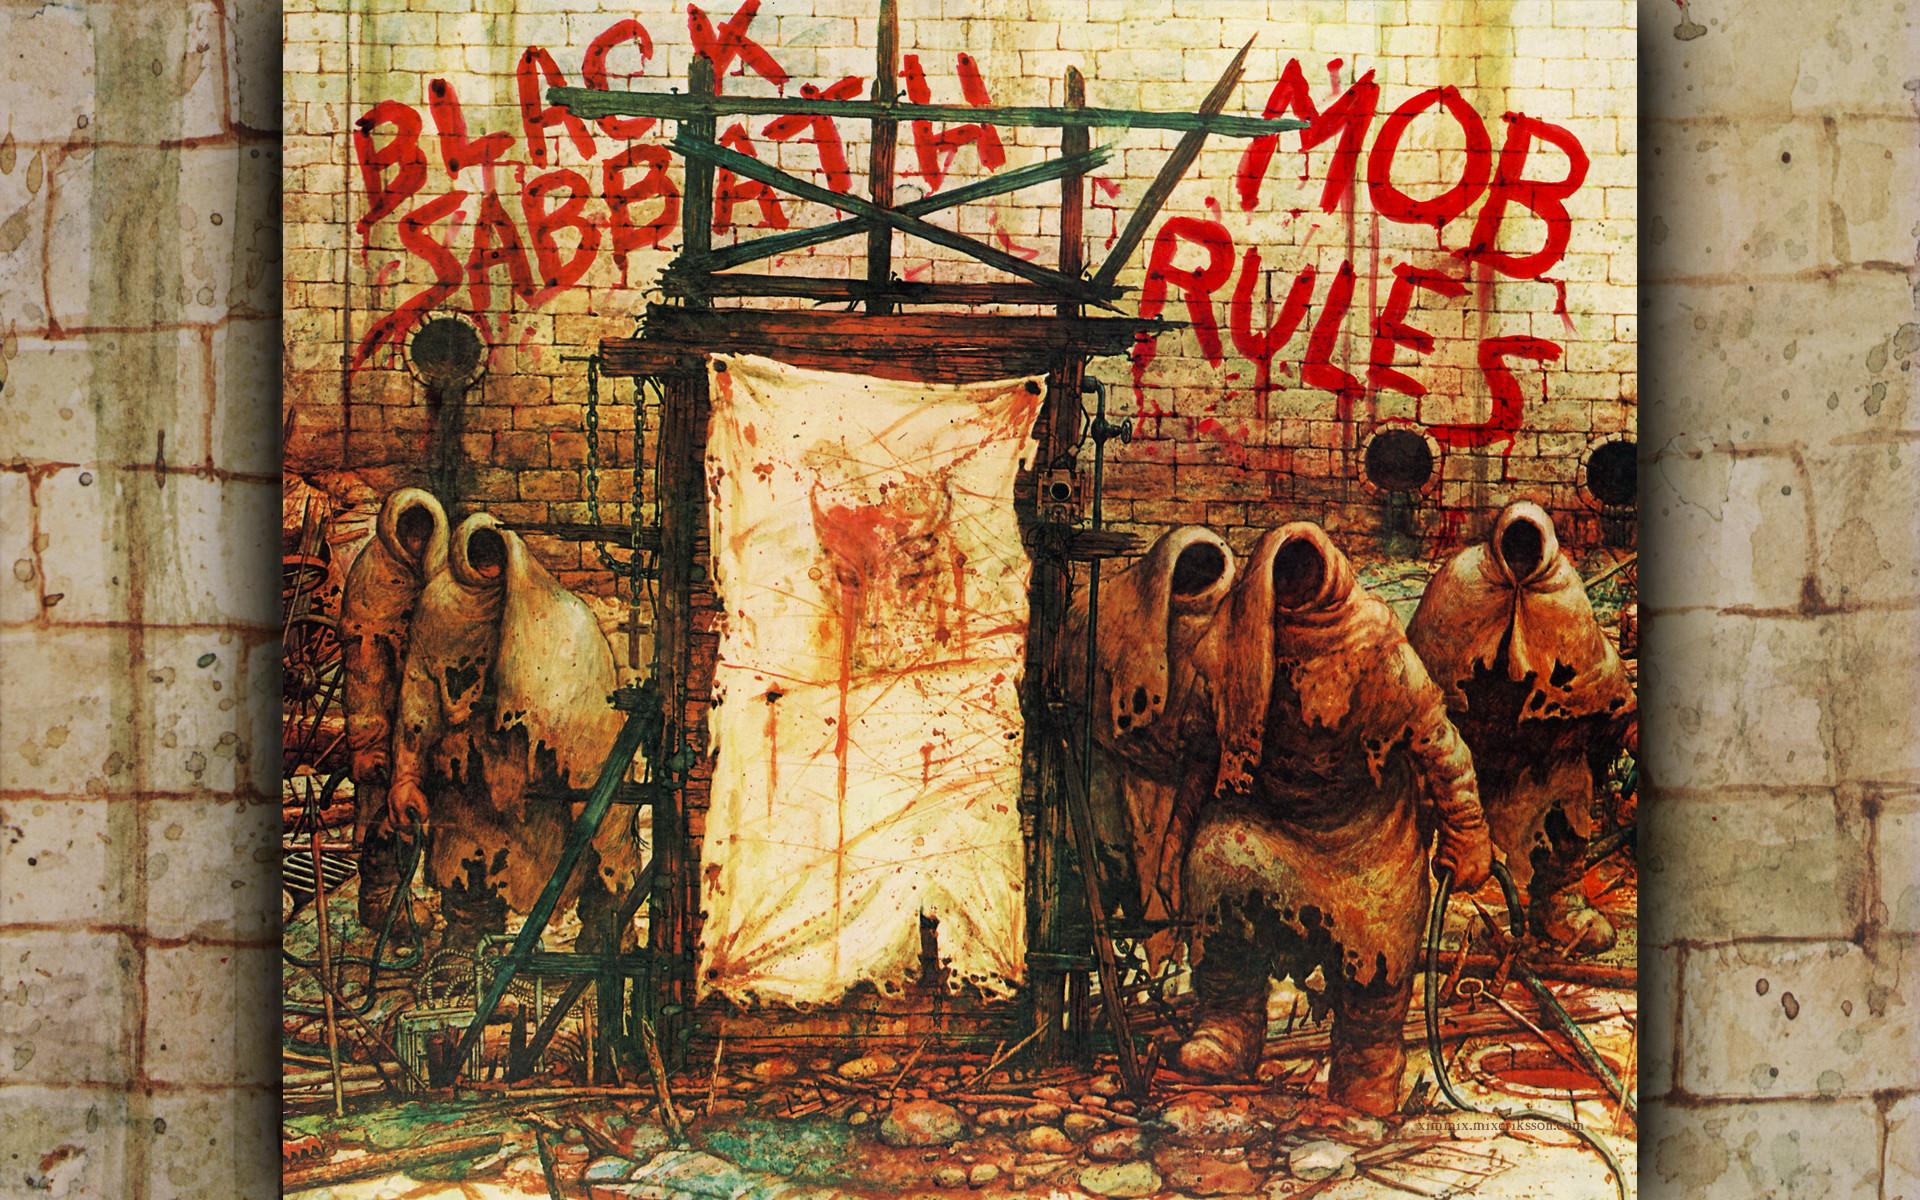 Music – Black Sabbath Heavy Metal Hard Rock Album Cover Wallpaper